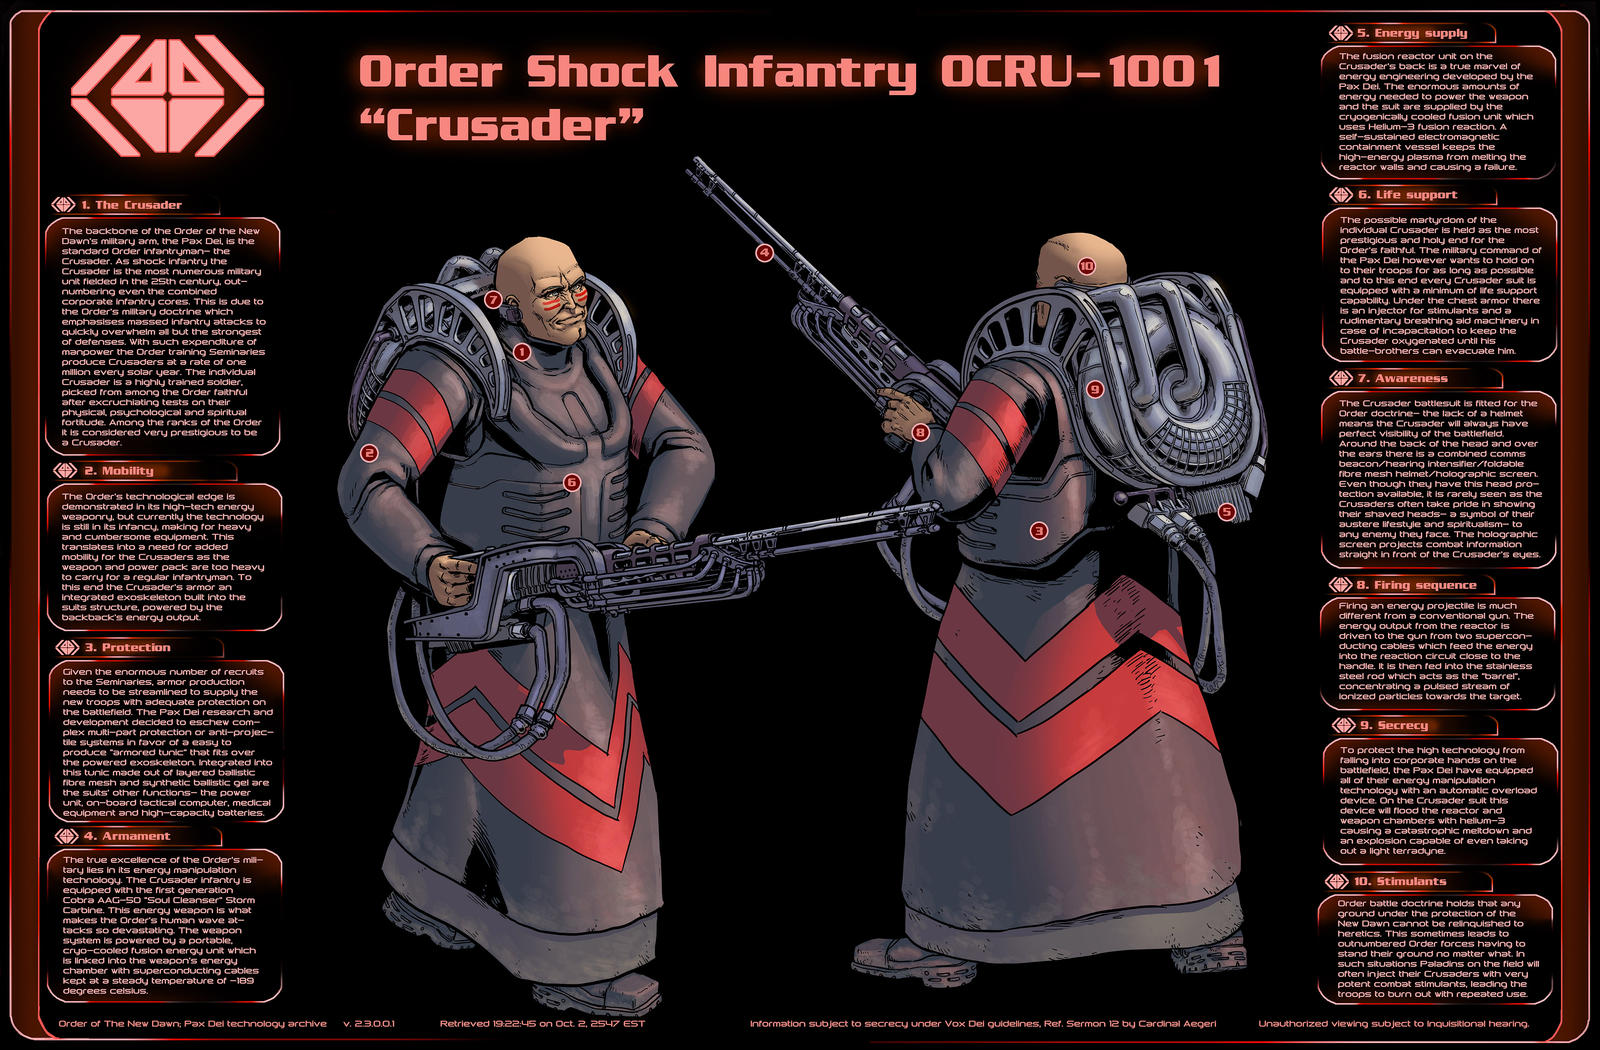 Order Crusader Infographic